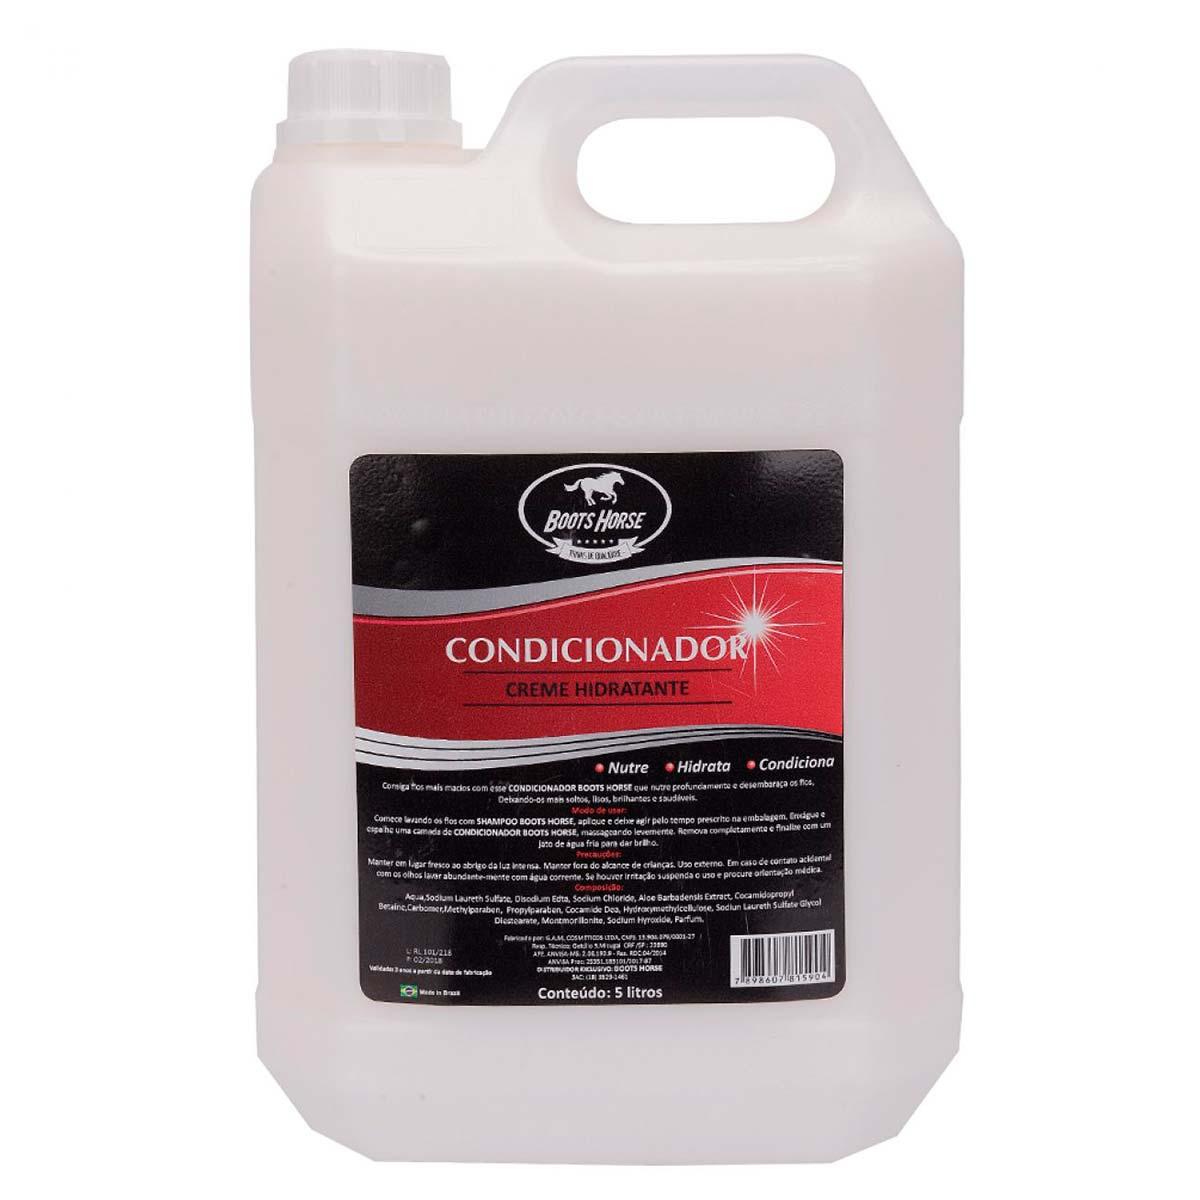 Condicionador Boots Horse Creme Hidratante 5 L Para Cavalo